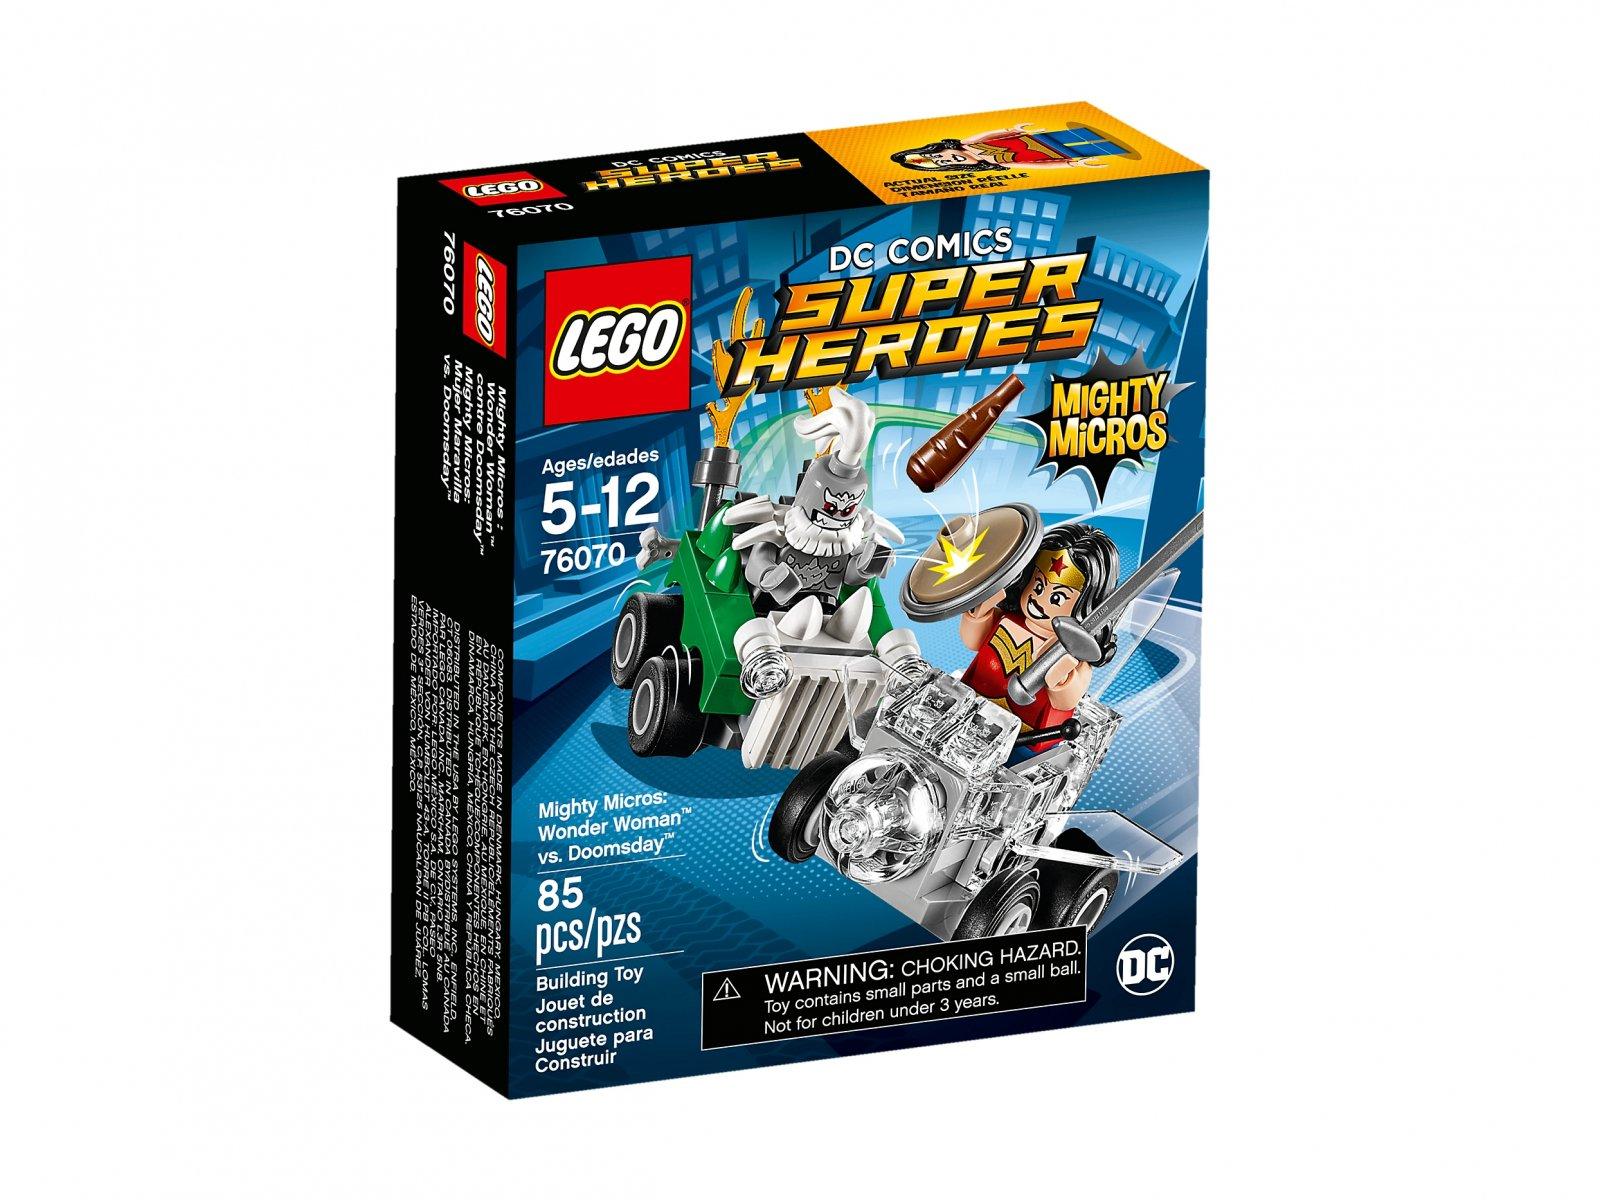 LEGO DC Comics™ Super Heroes Wonder Woman™ kontra Doomsday™